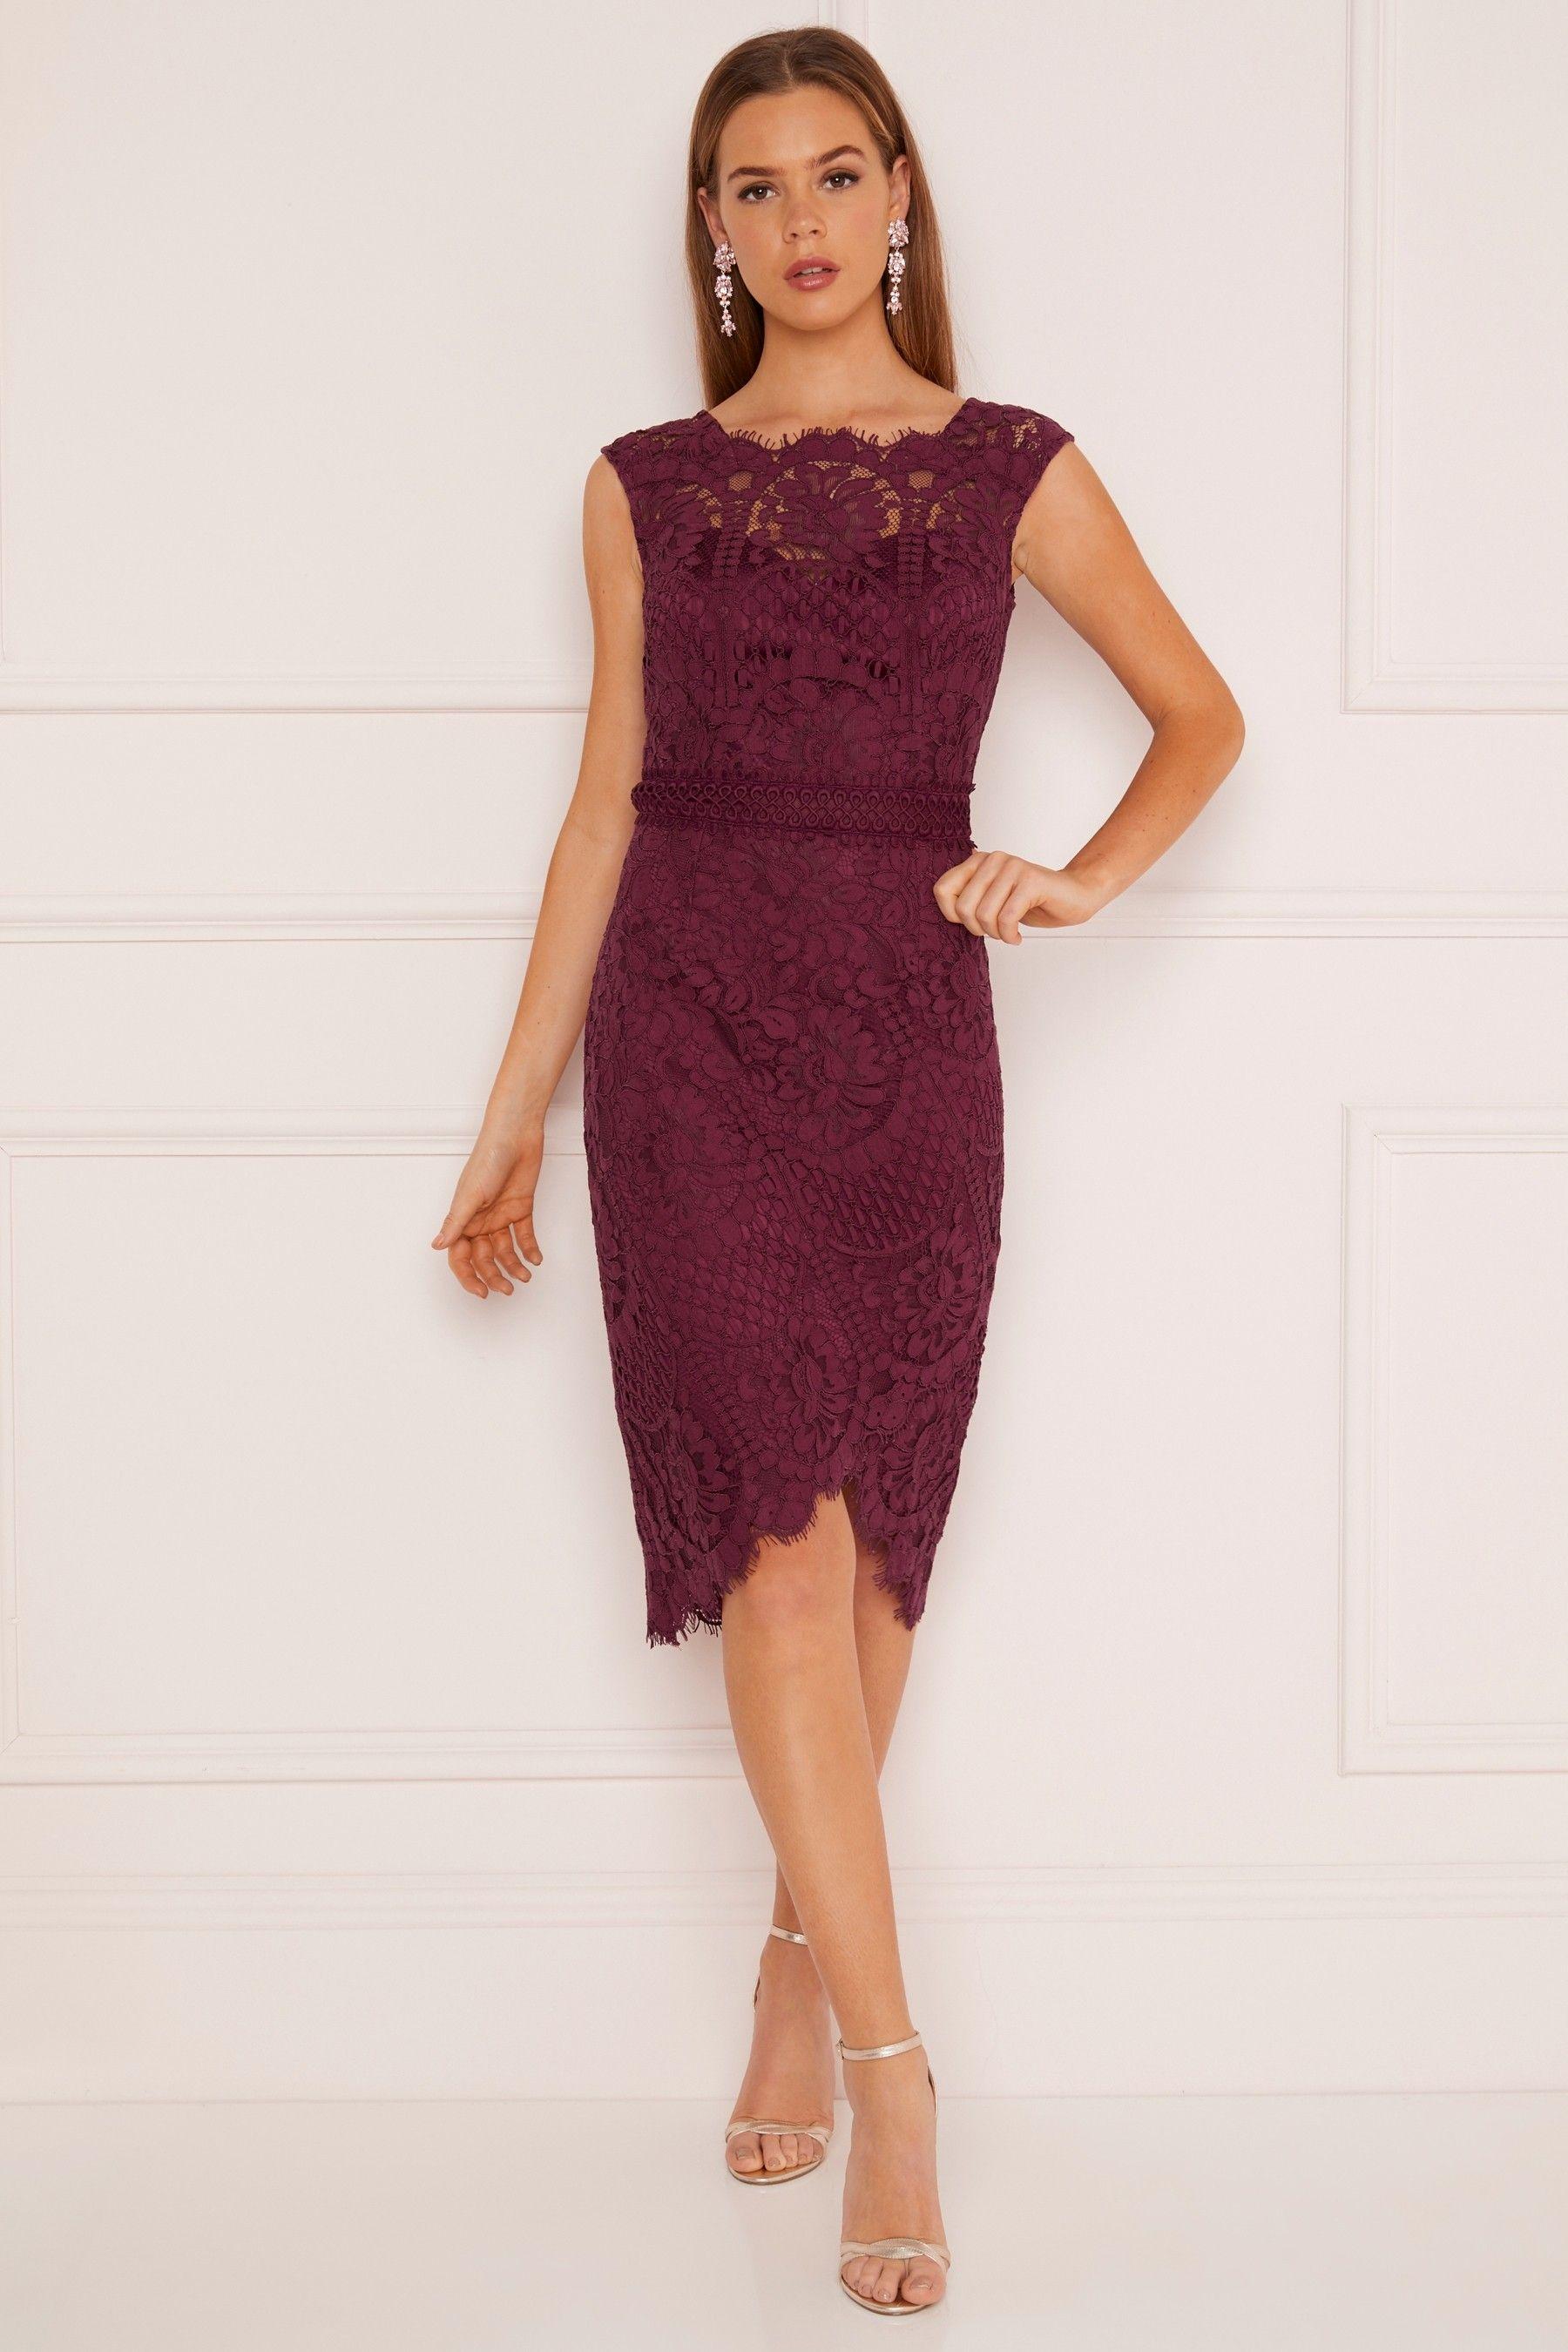 78d2a76d343 Womens Lipsy VIP Asymmetric Lace Bodycon Dress - Red